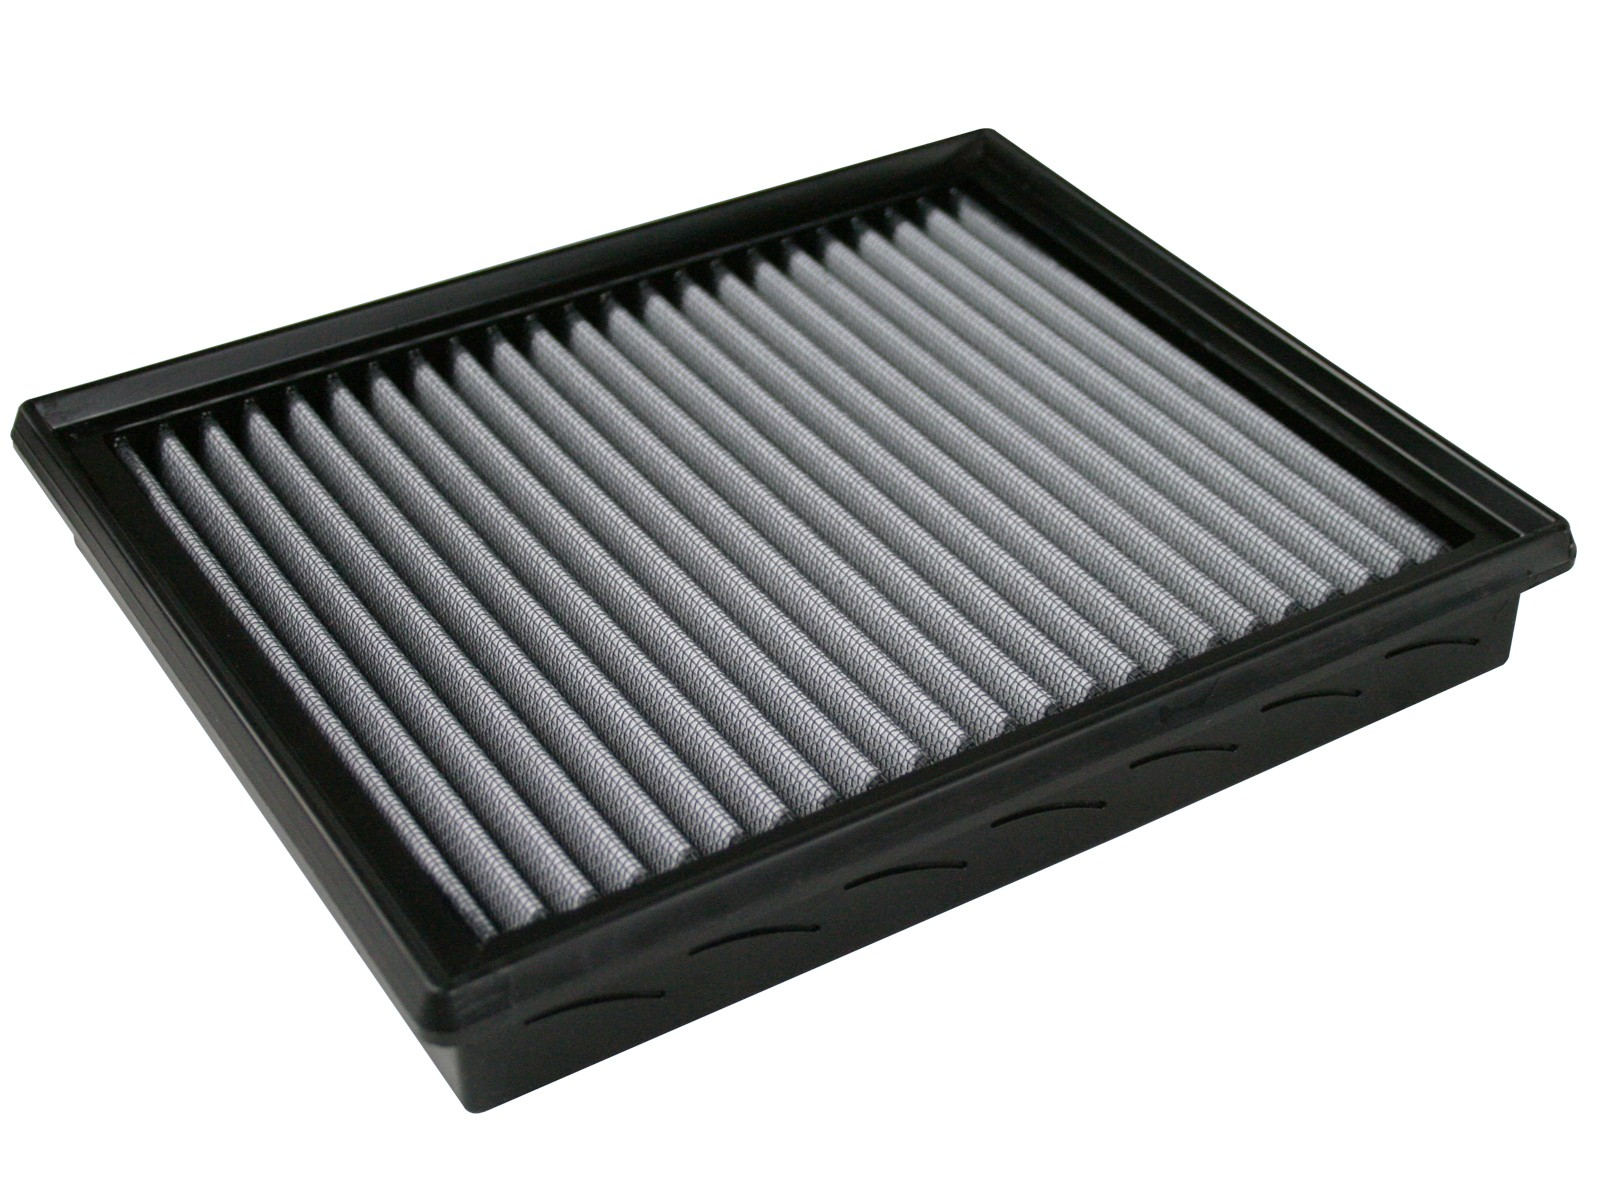 aFe POWER 31-10044 Magnum FLOW Pro DRY S Air Filter